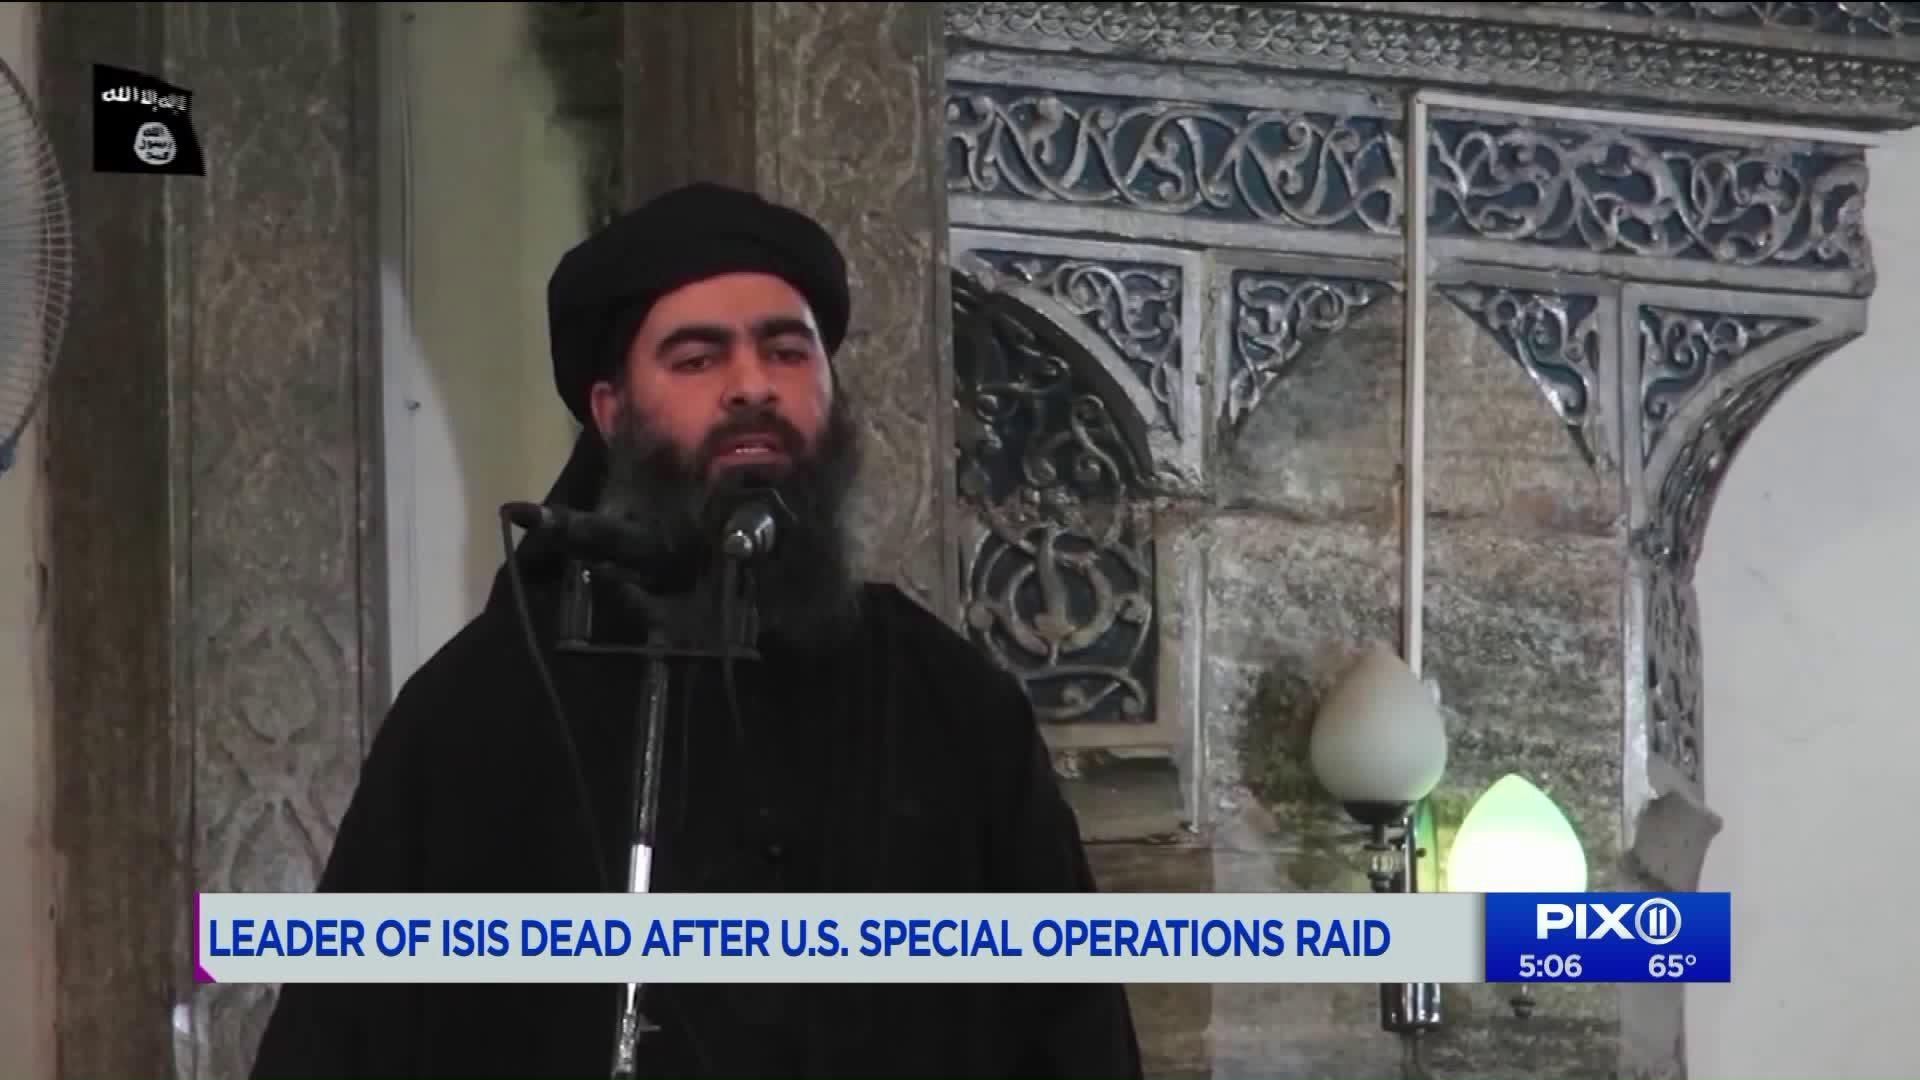 ISIS confirms death of group leader Al-Baghdadi - Daily